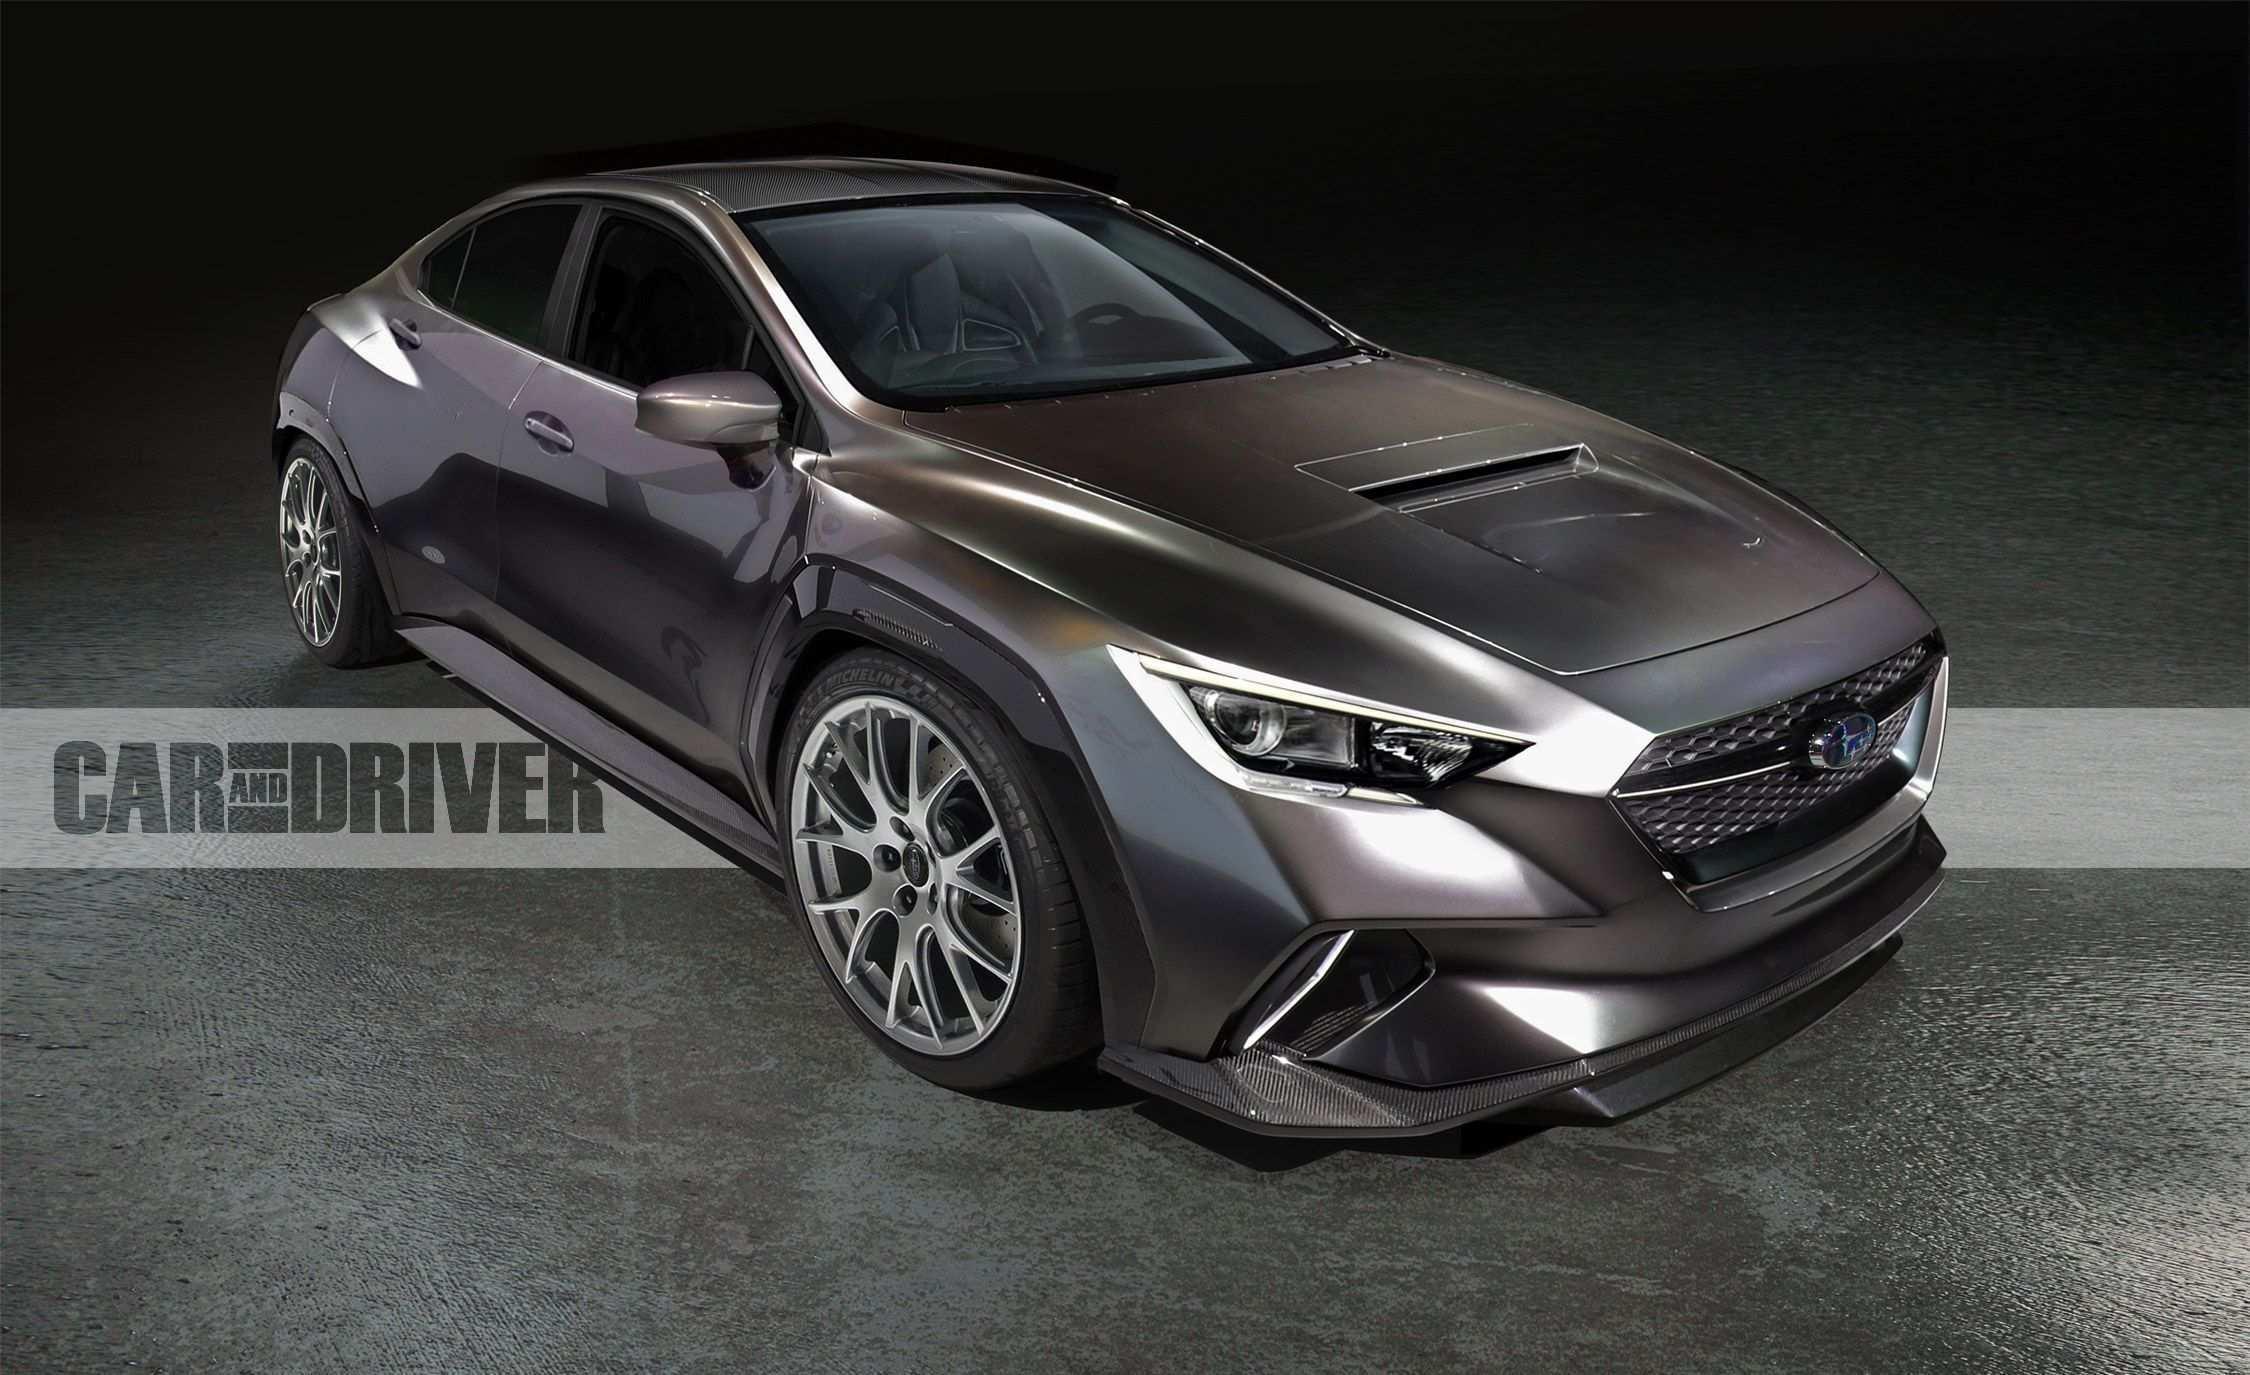 78 Best Review 2020 Subaru Wrx Redesign Redesign by 2020 Subaru Wrx Redesign